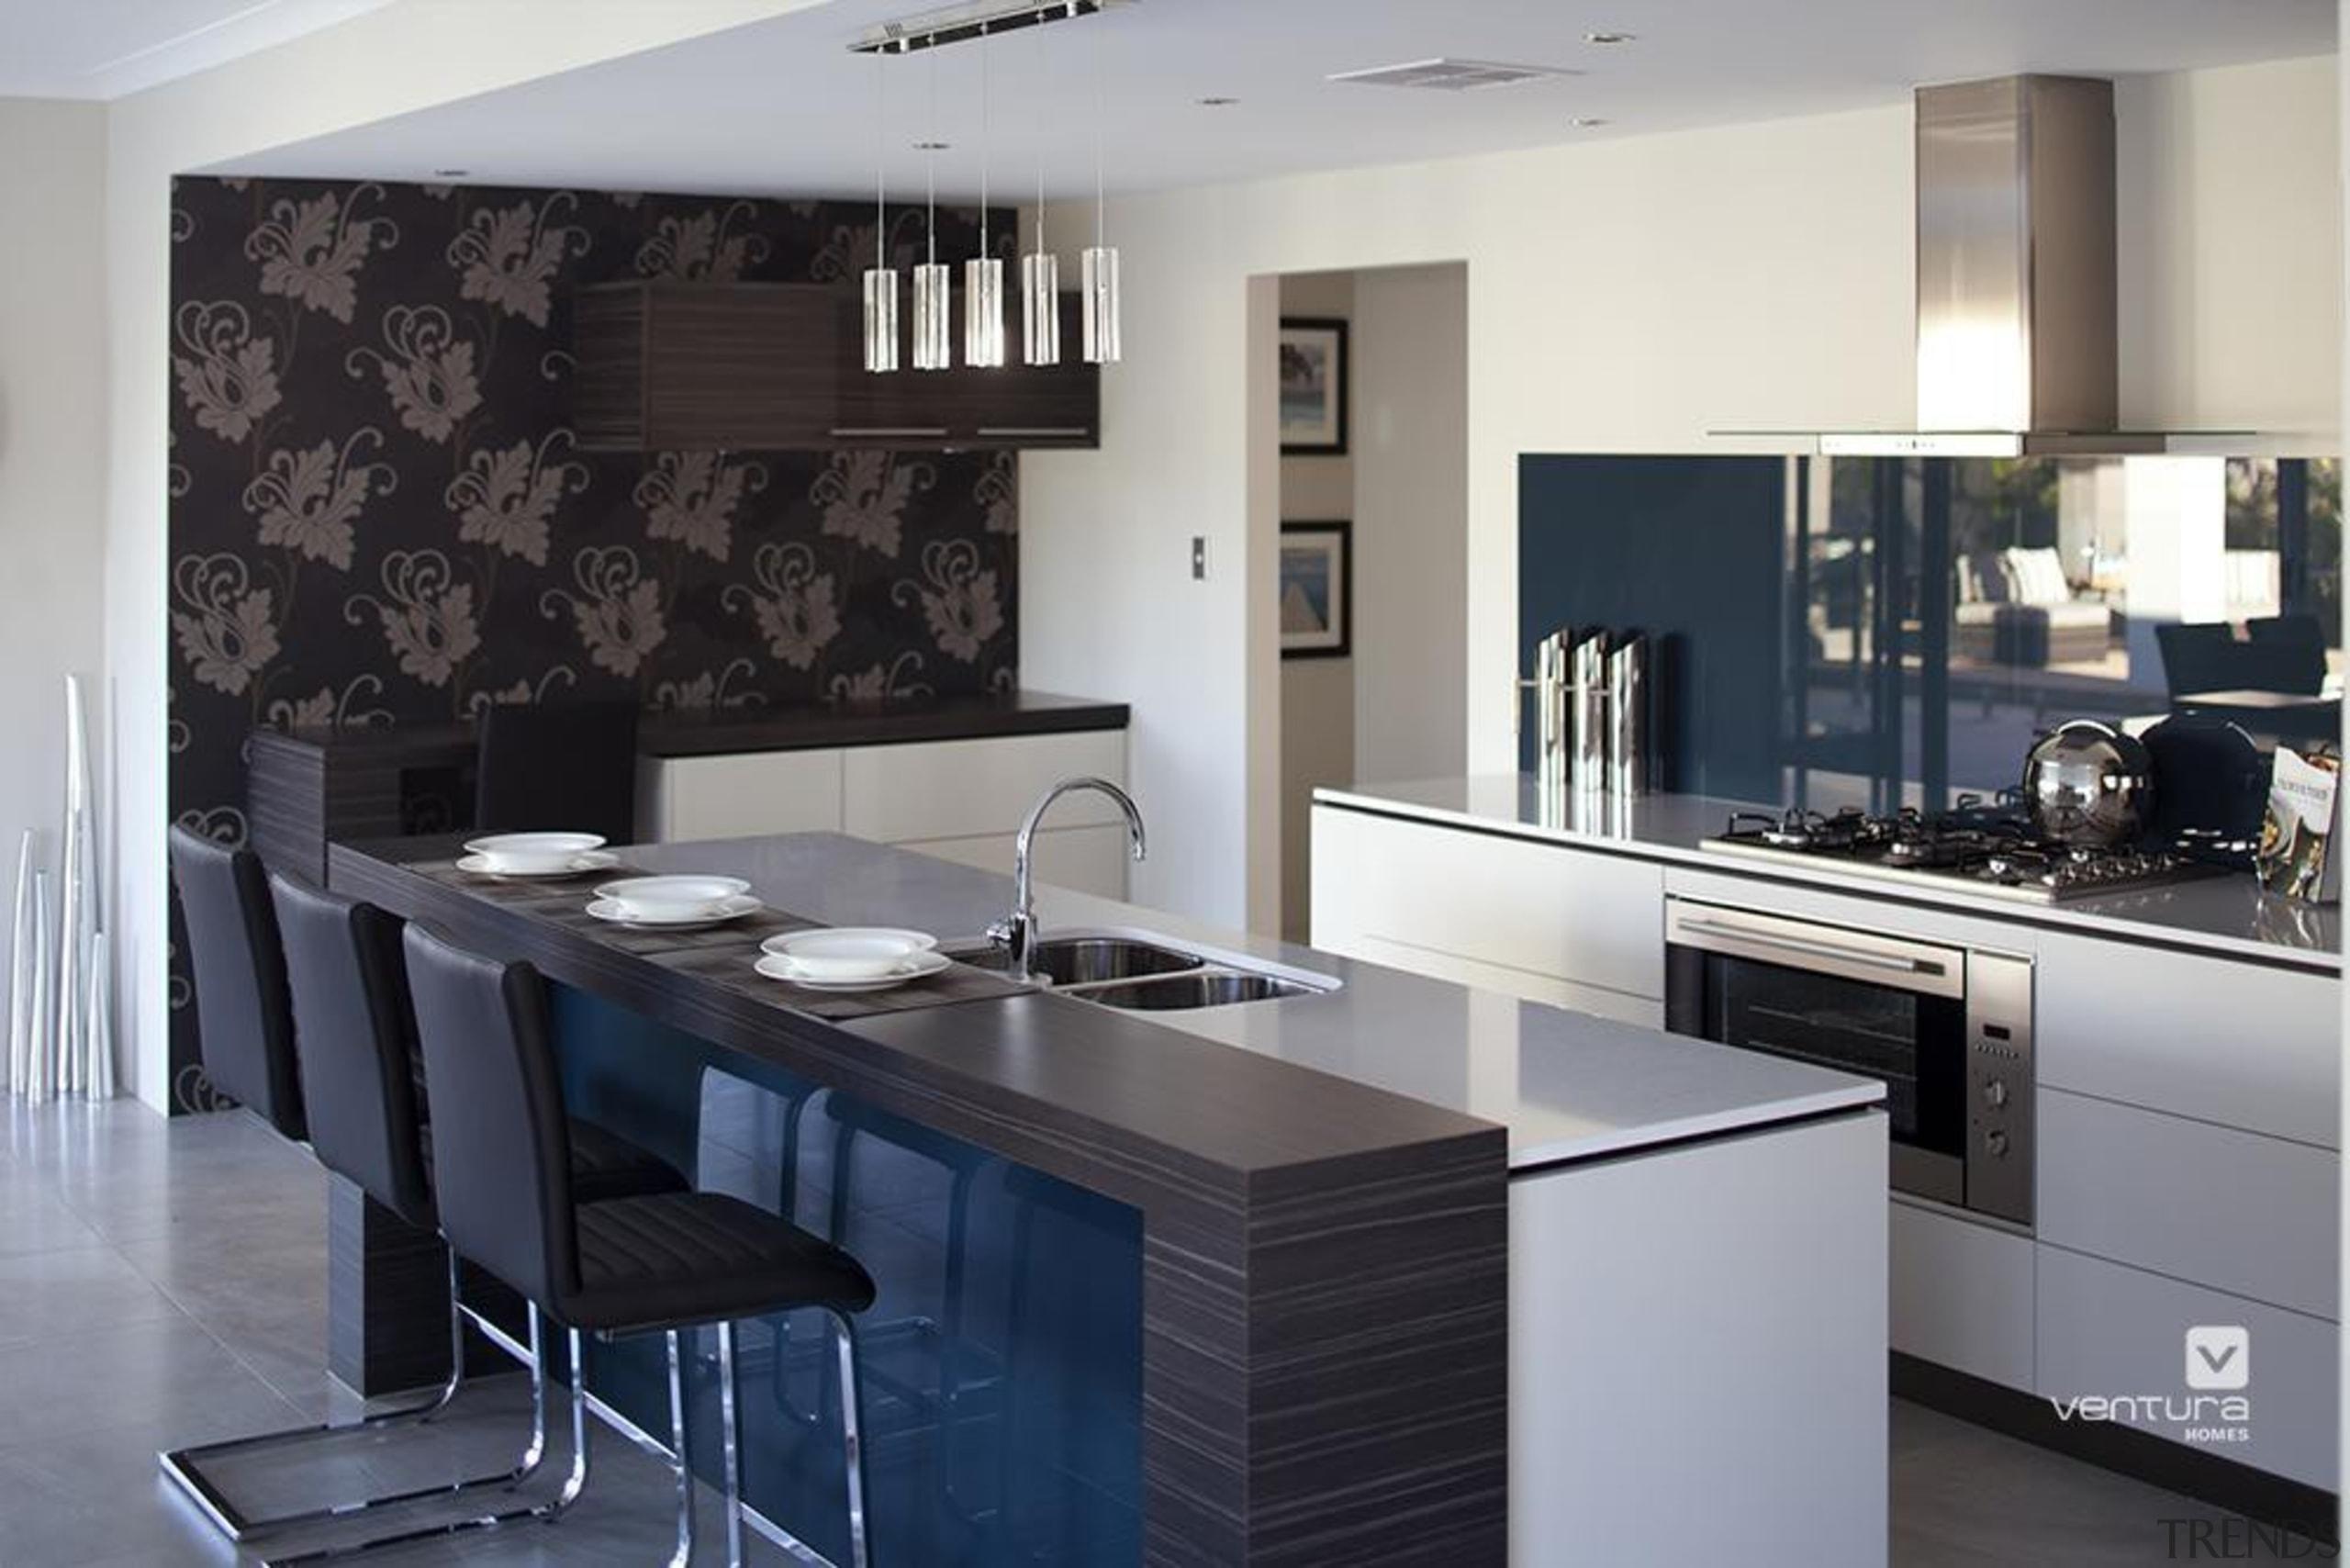 Kitchen design. - The Sentosa Display Home - countertop, interior design, kitchen, room, gray, black